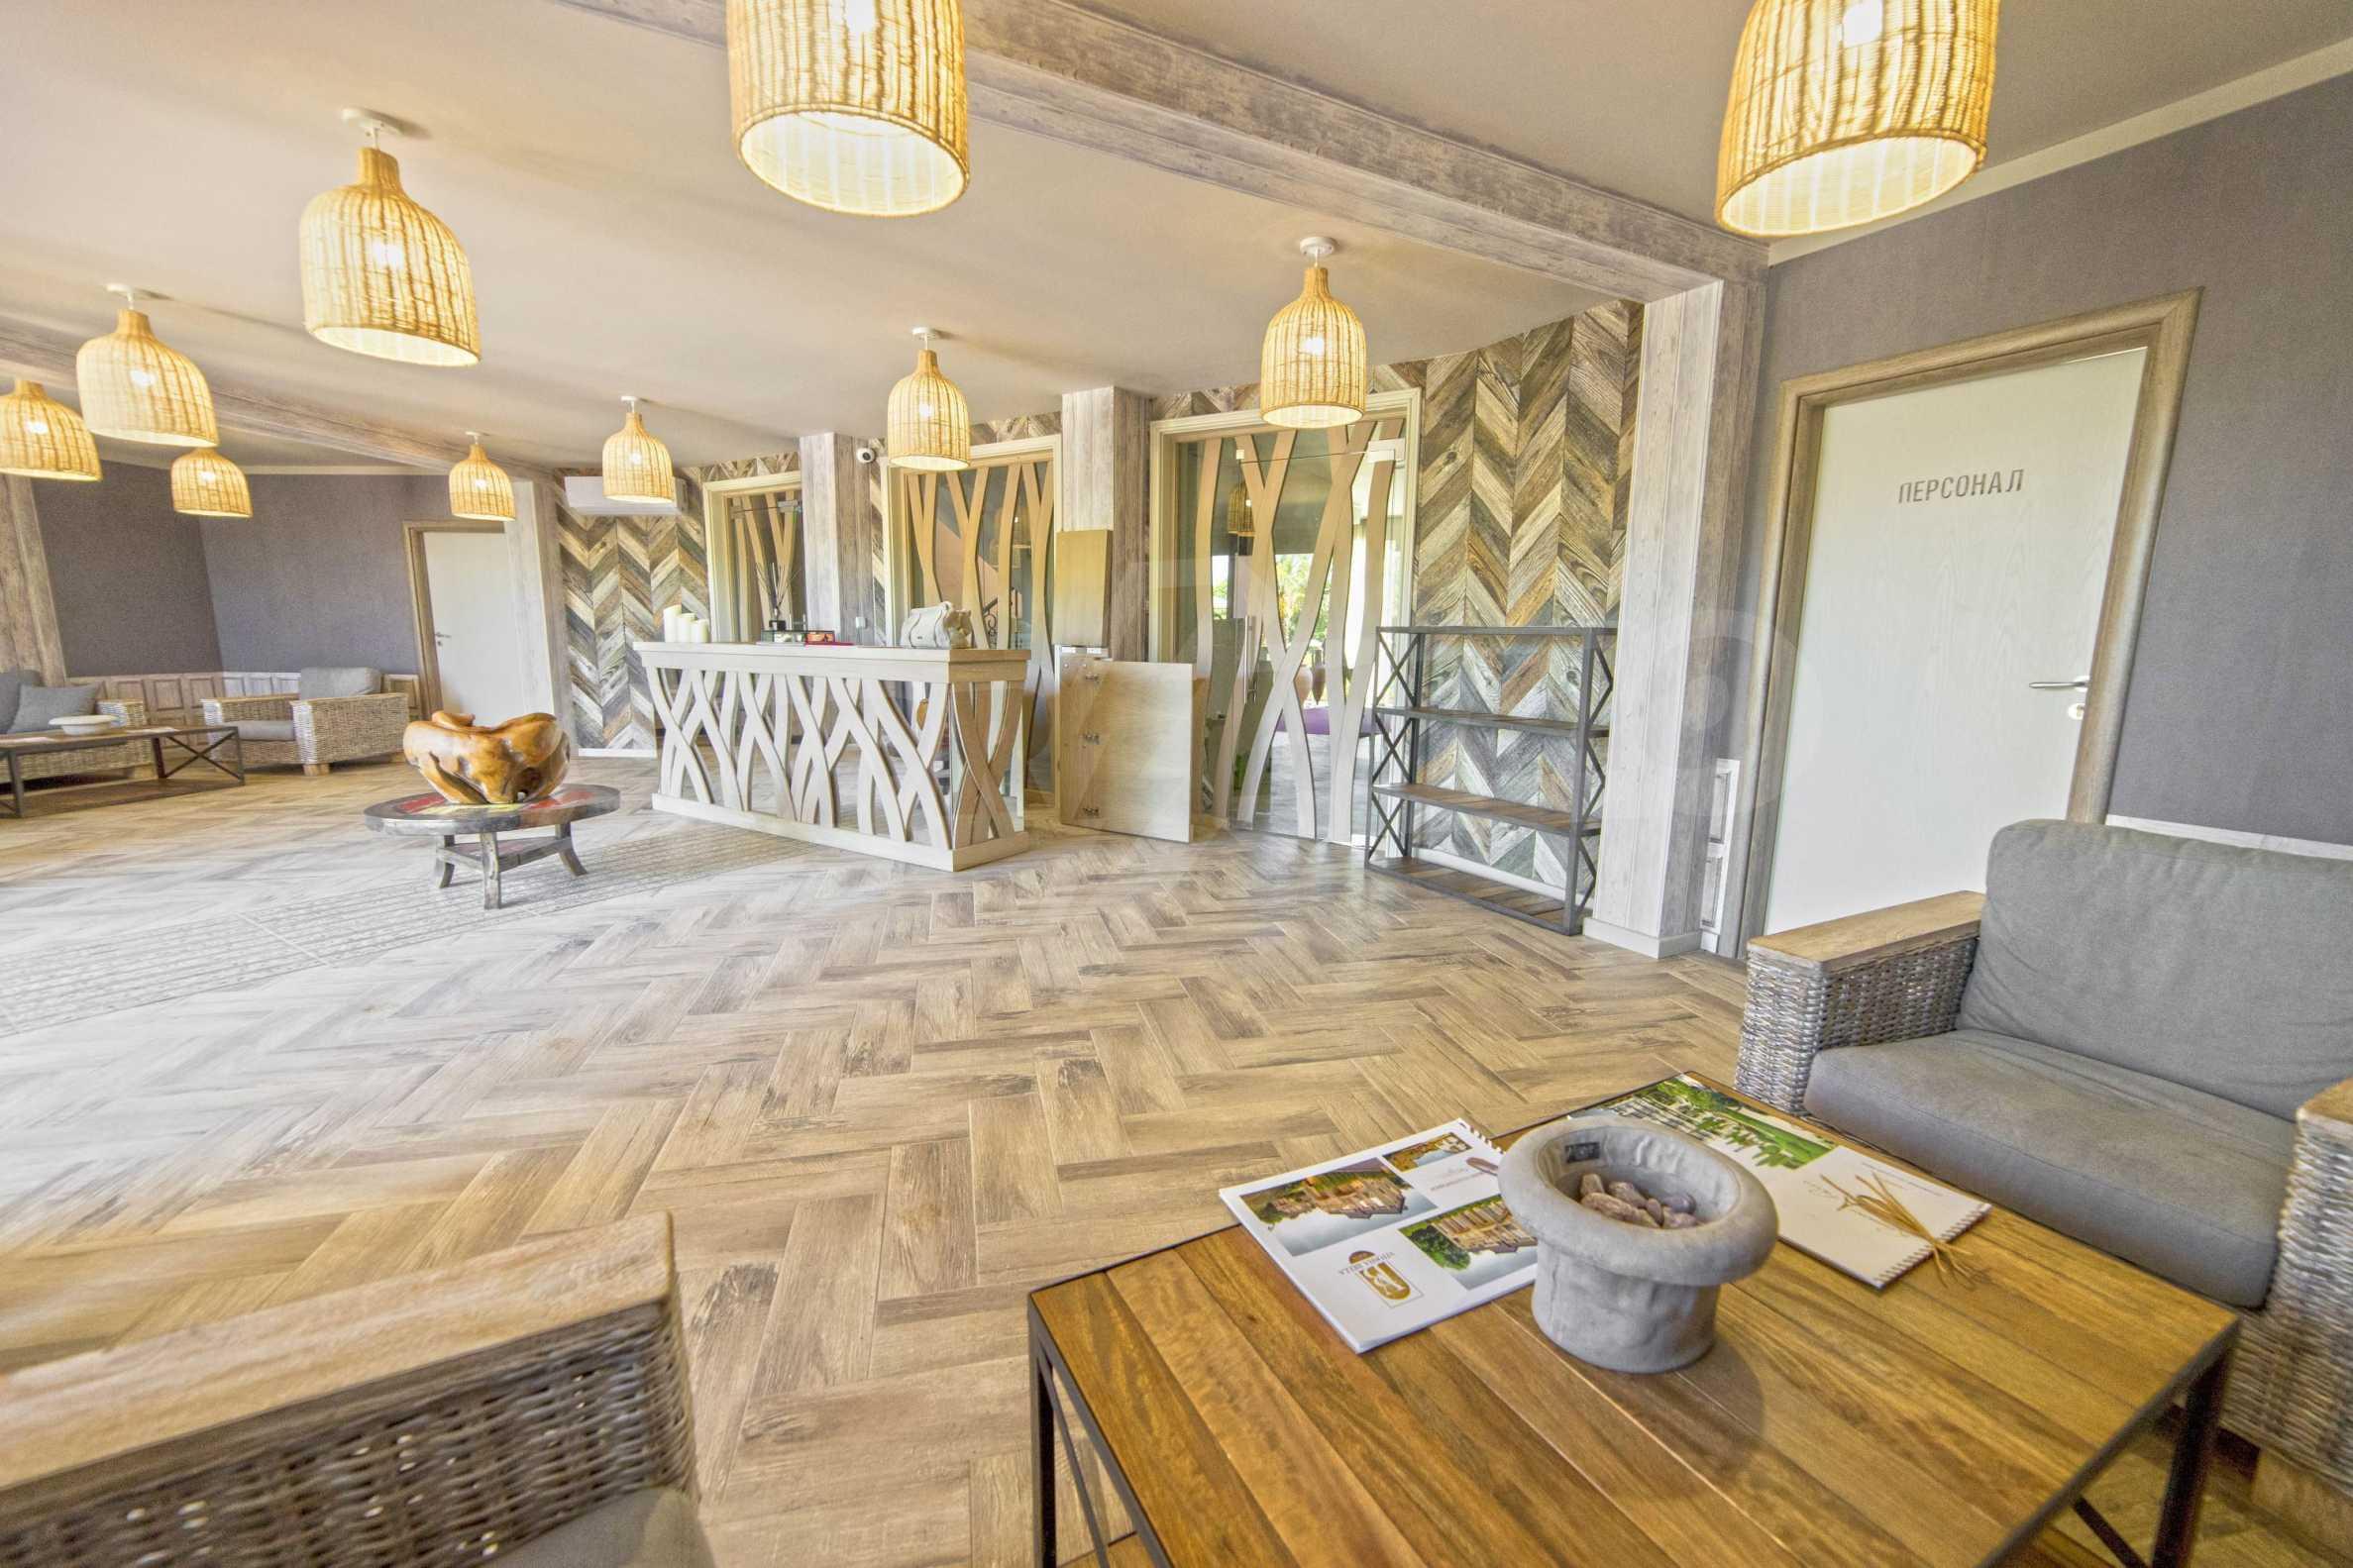 New 1-bedroom apartment in a coastal complex by the Kavatsite Beach (Sozopol) 26